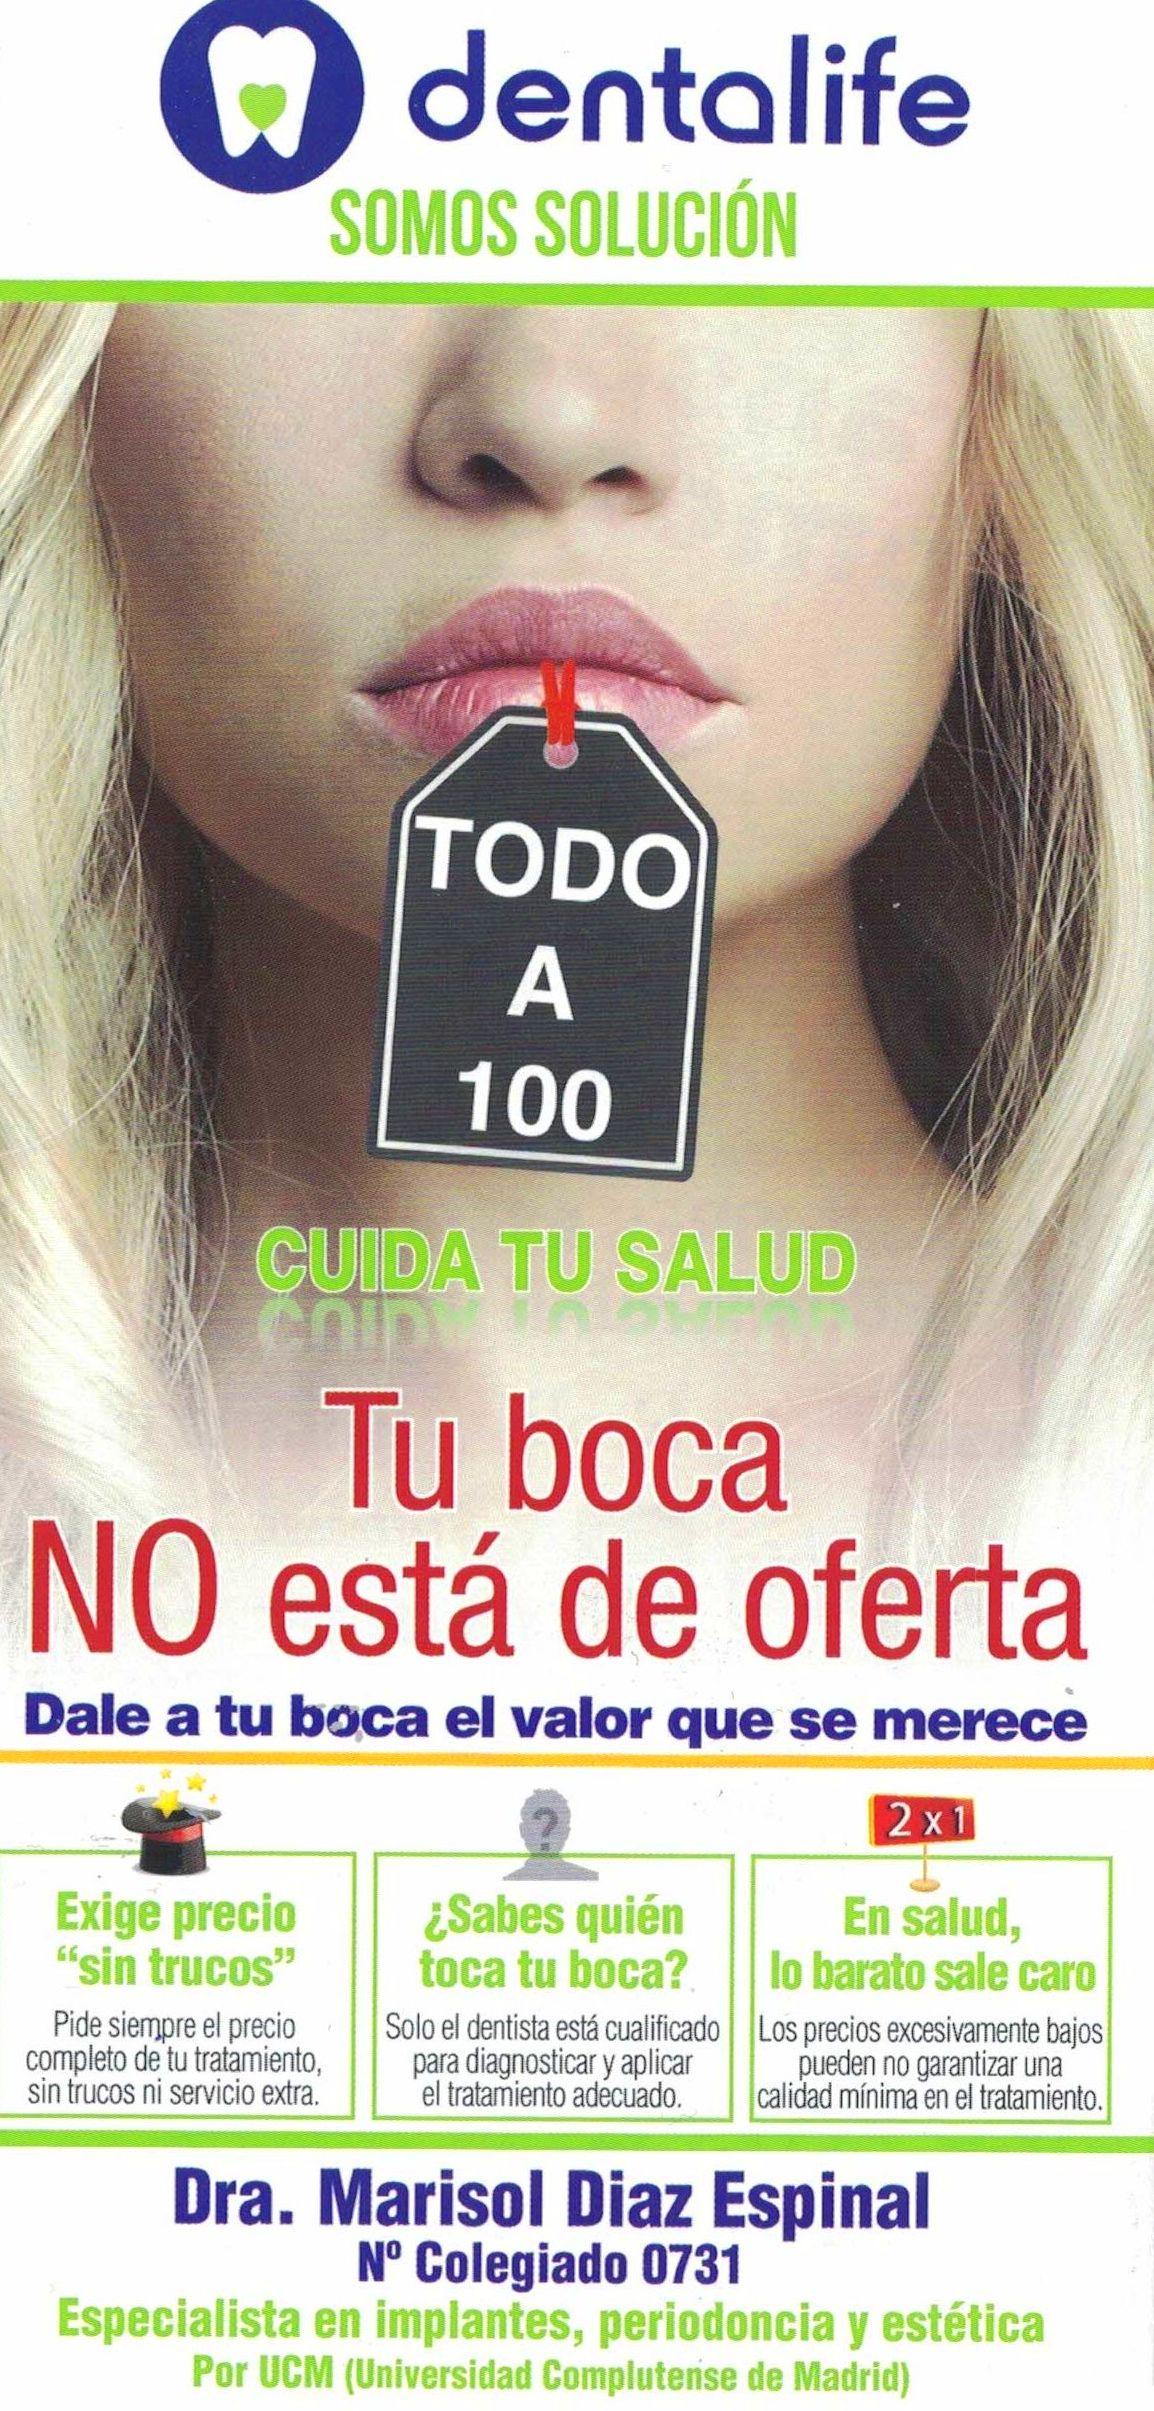 Foto 4 de Clínica dental en Cáceres | Clínicas Dentalife